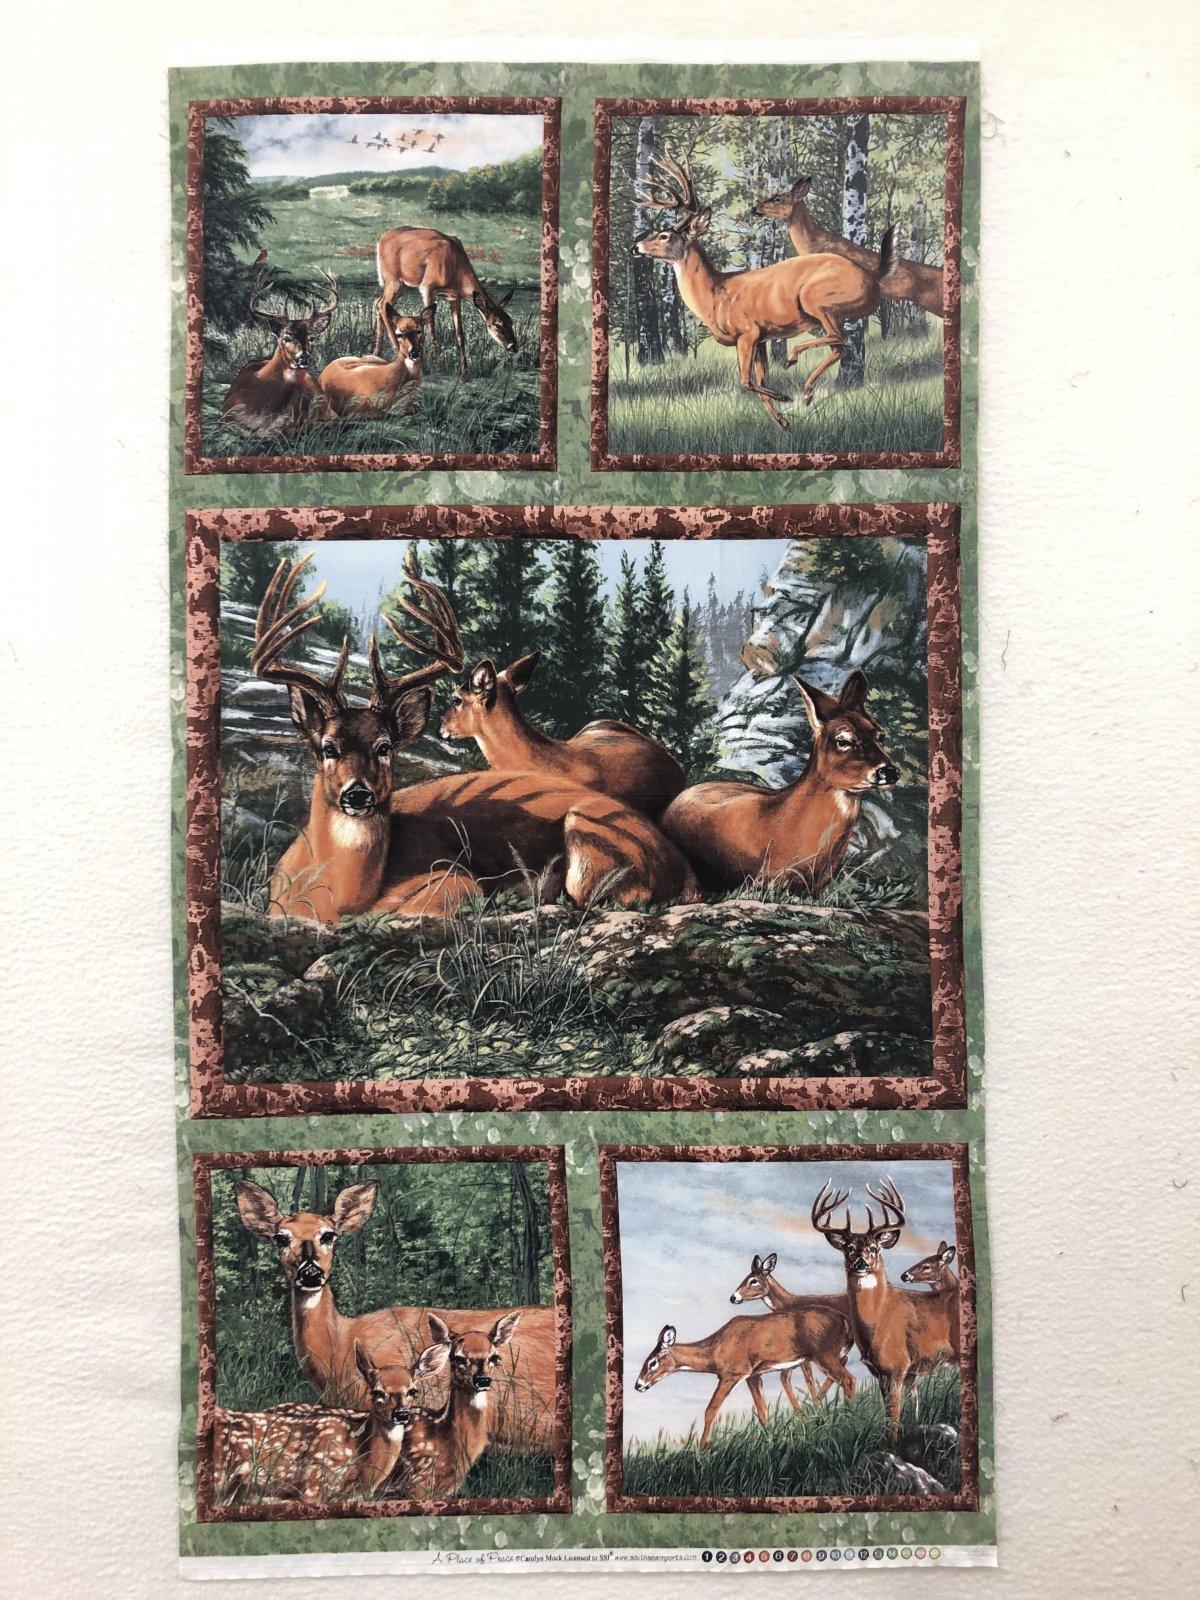 Wilmington Deer Meadow A Place Of Peace Panel Deer  '